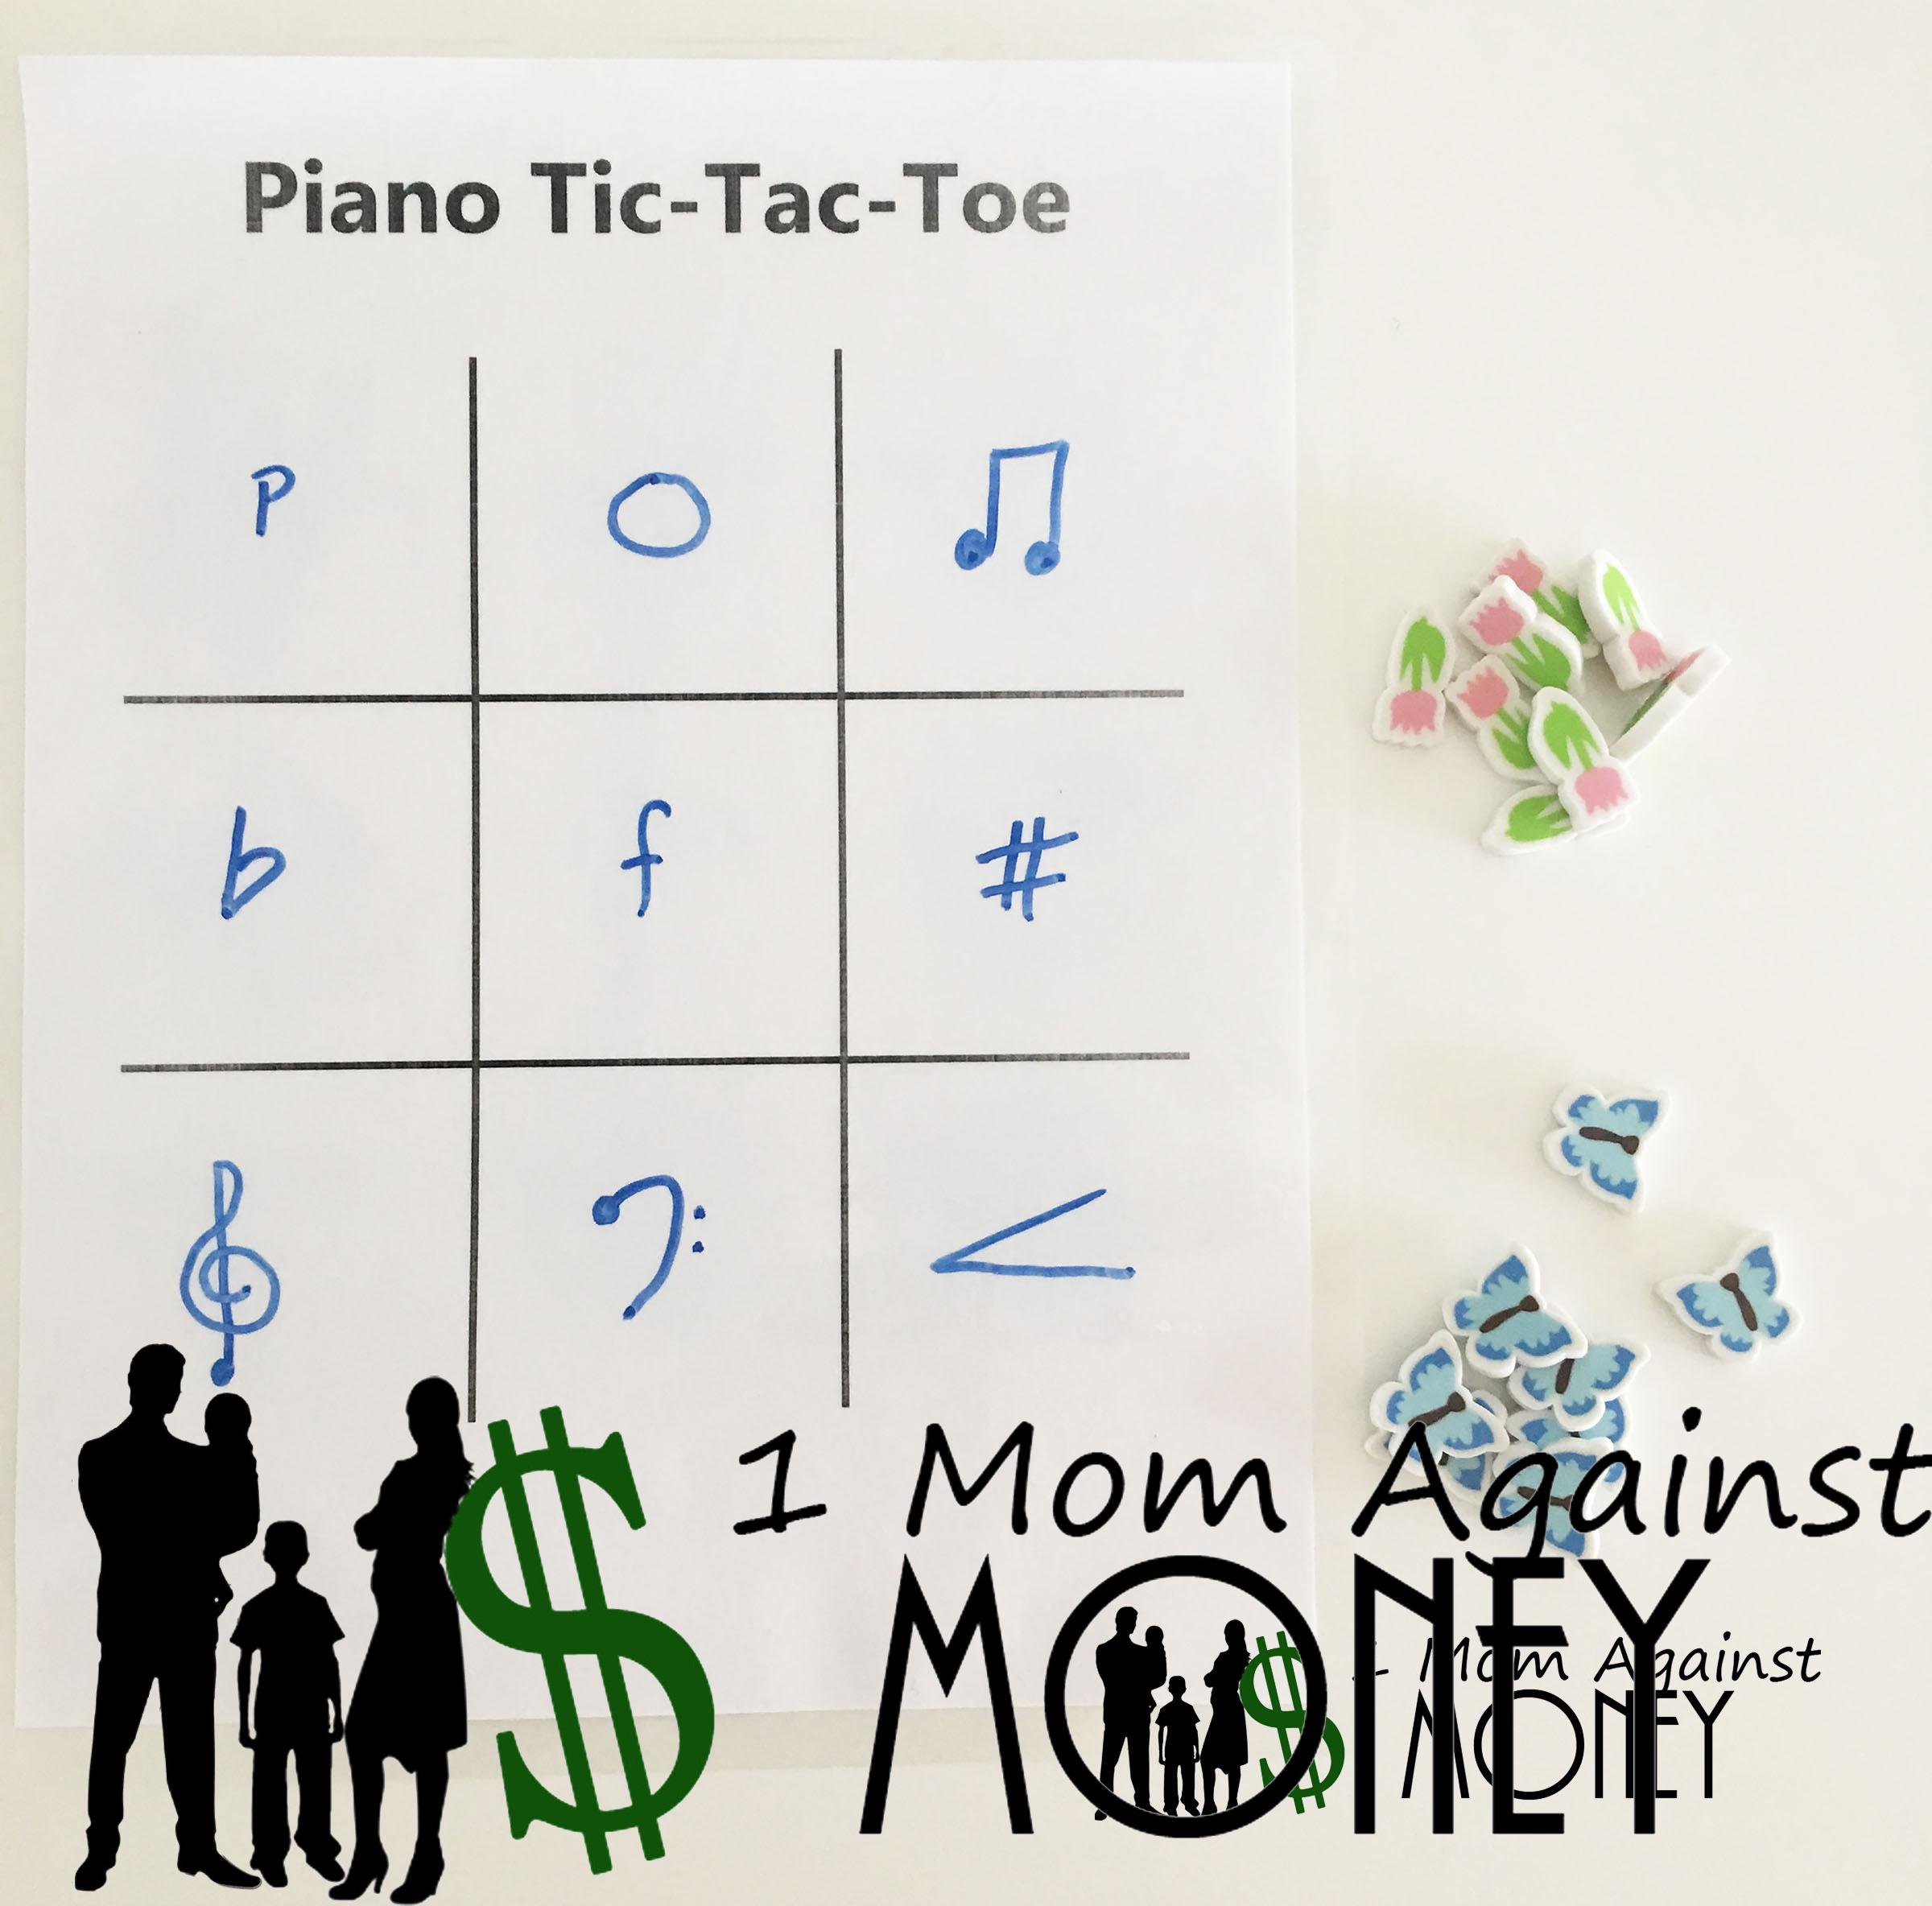 Piano Tic-Tac-Toe Game